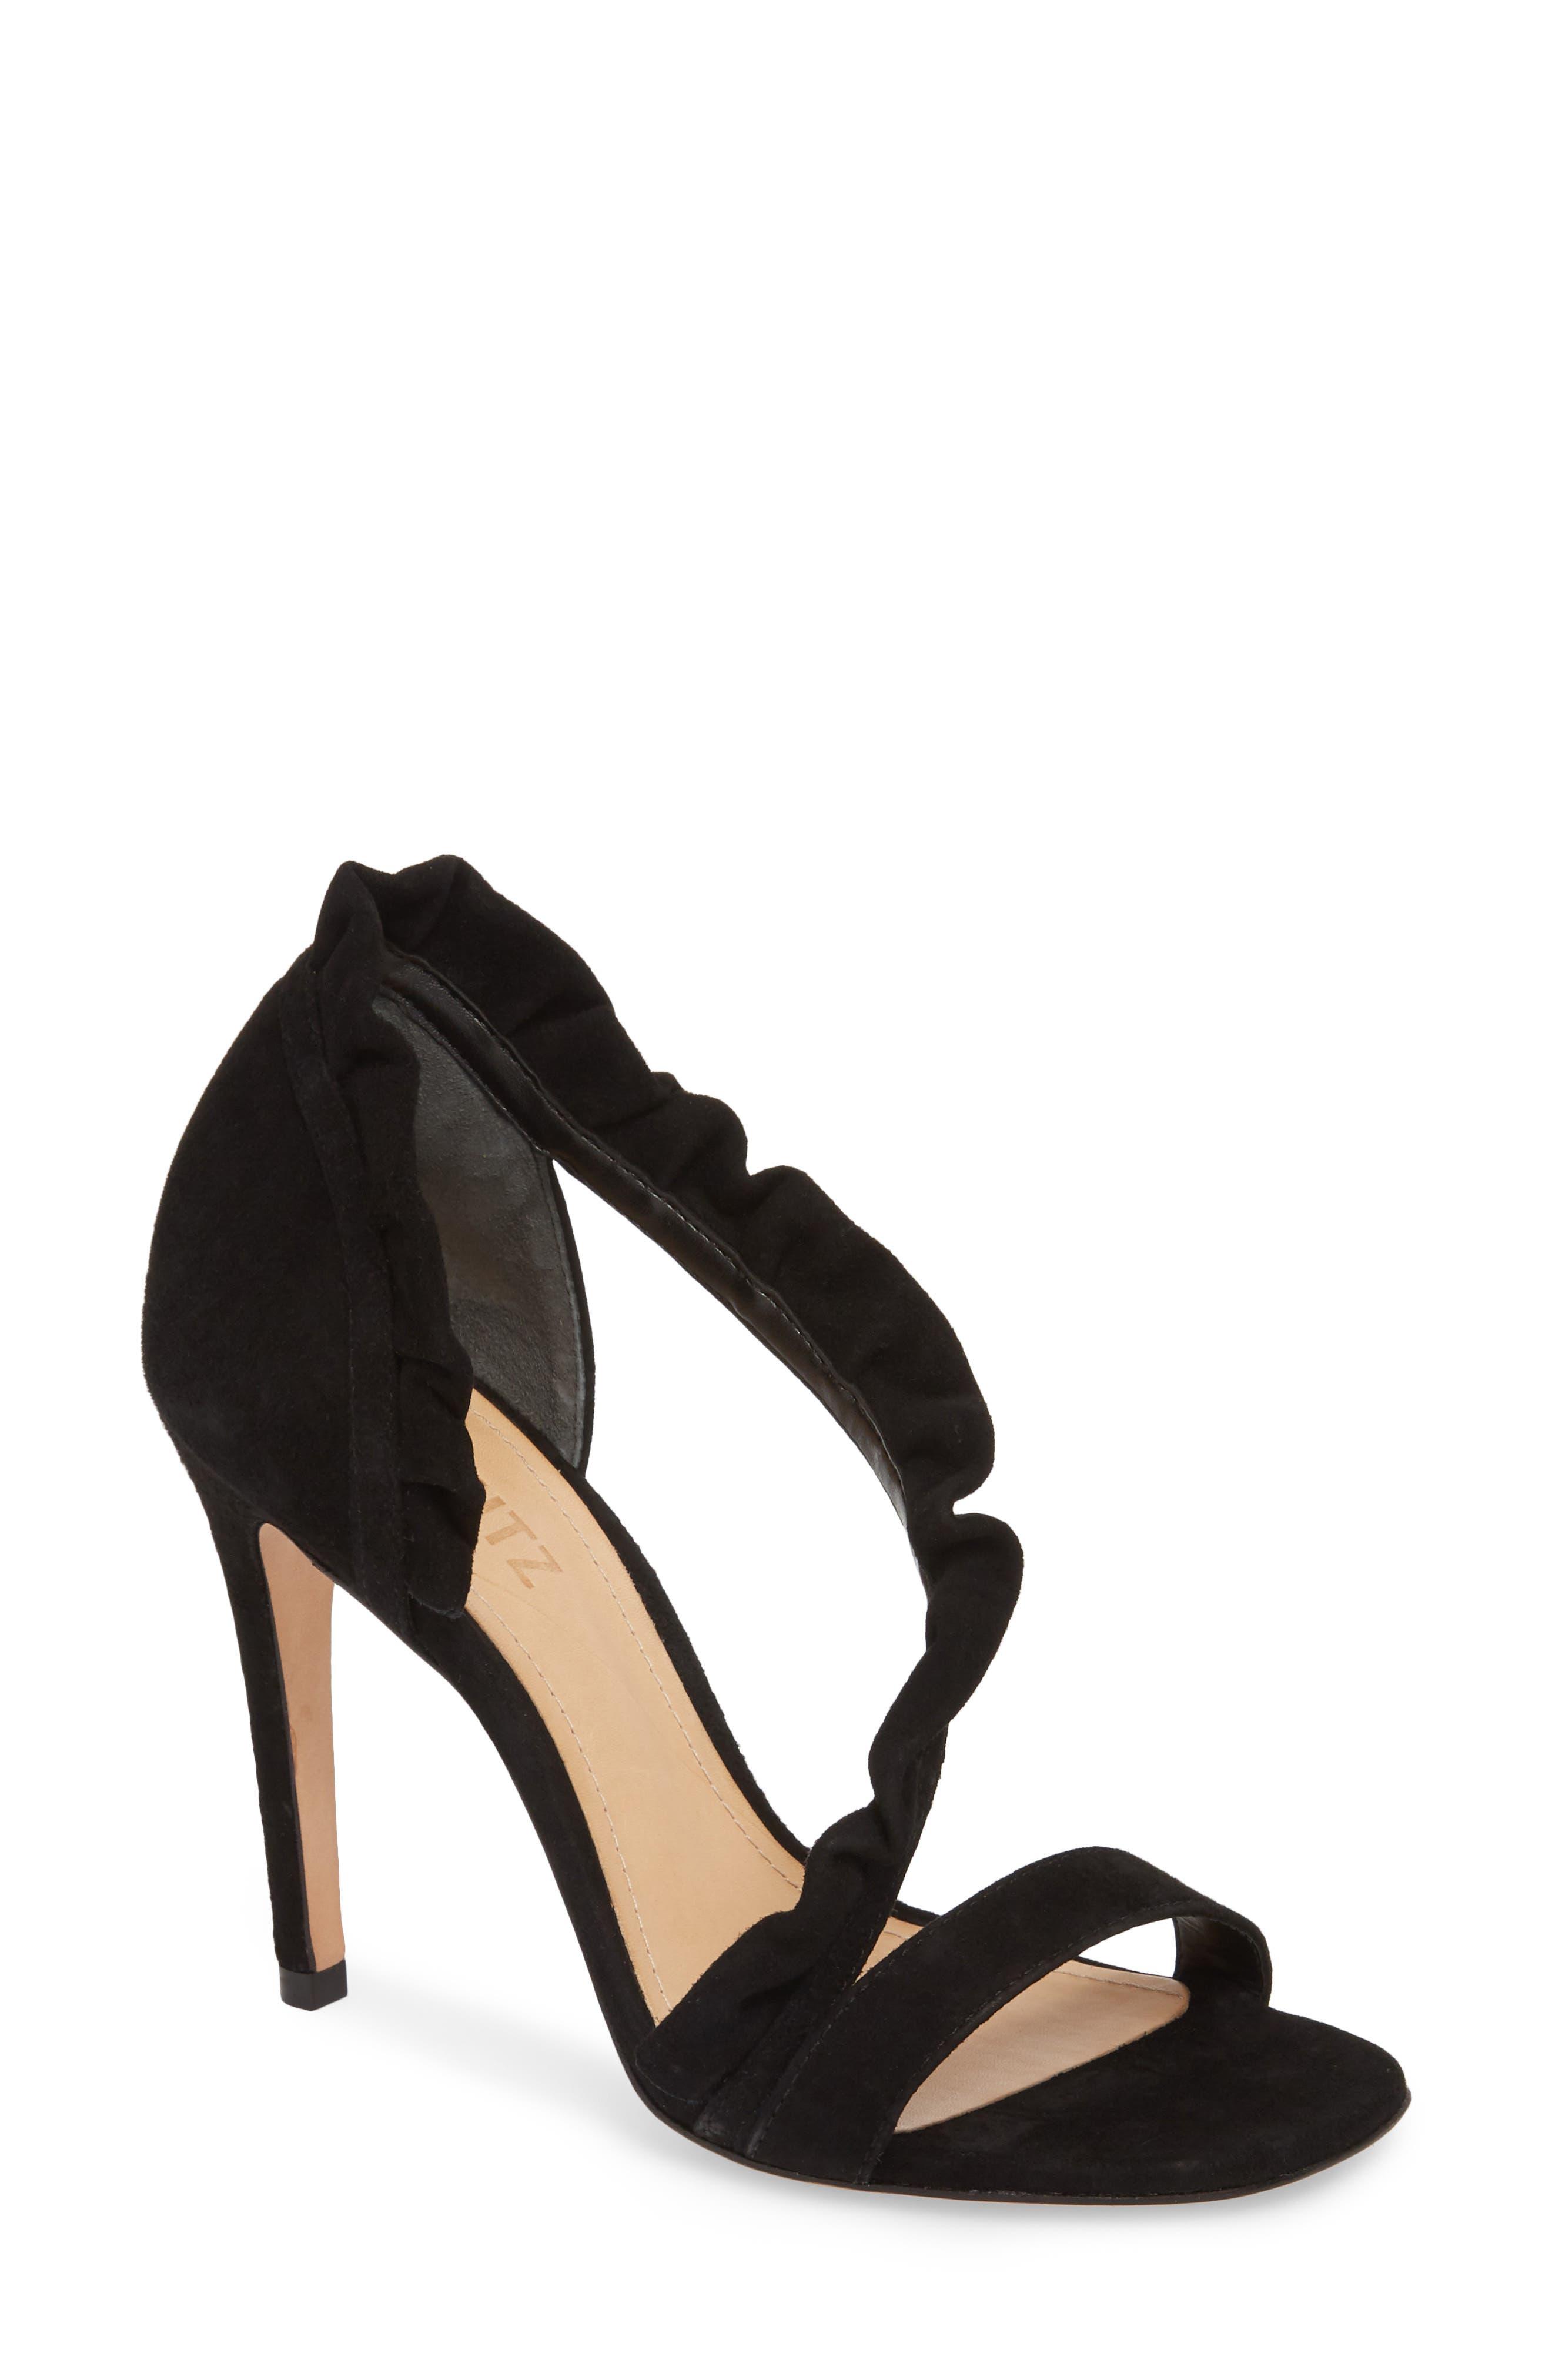 Aim Ruffle Sandal,                             Main thumbnail 1, color,                             BLACK SUEDE